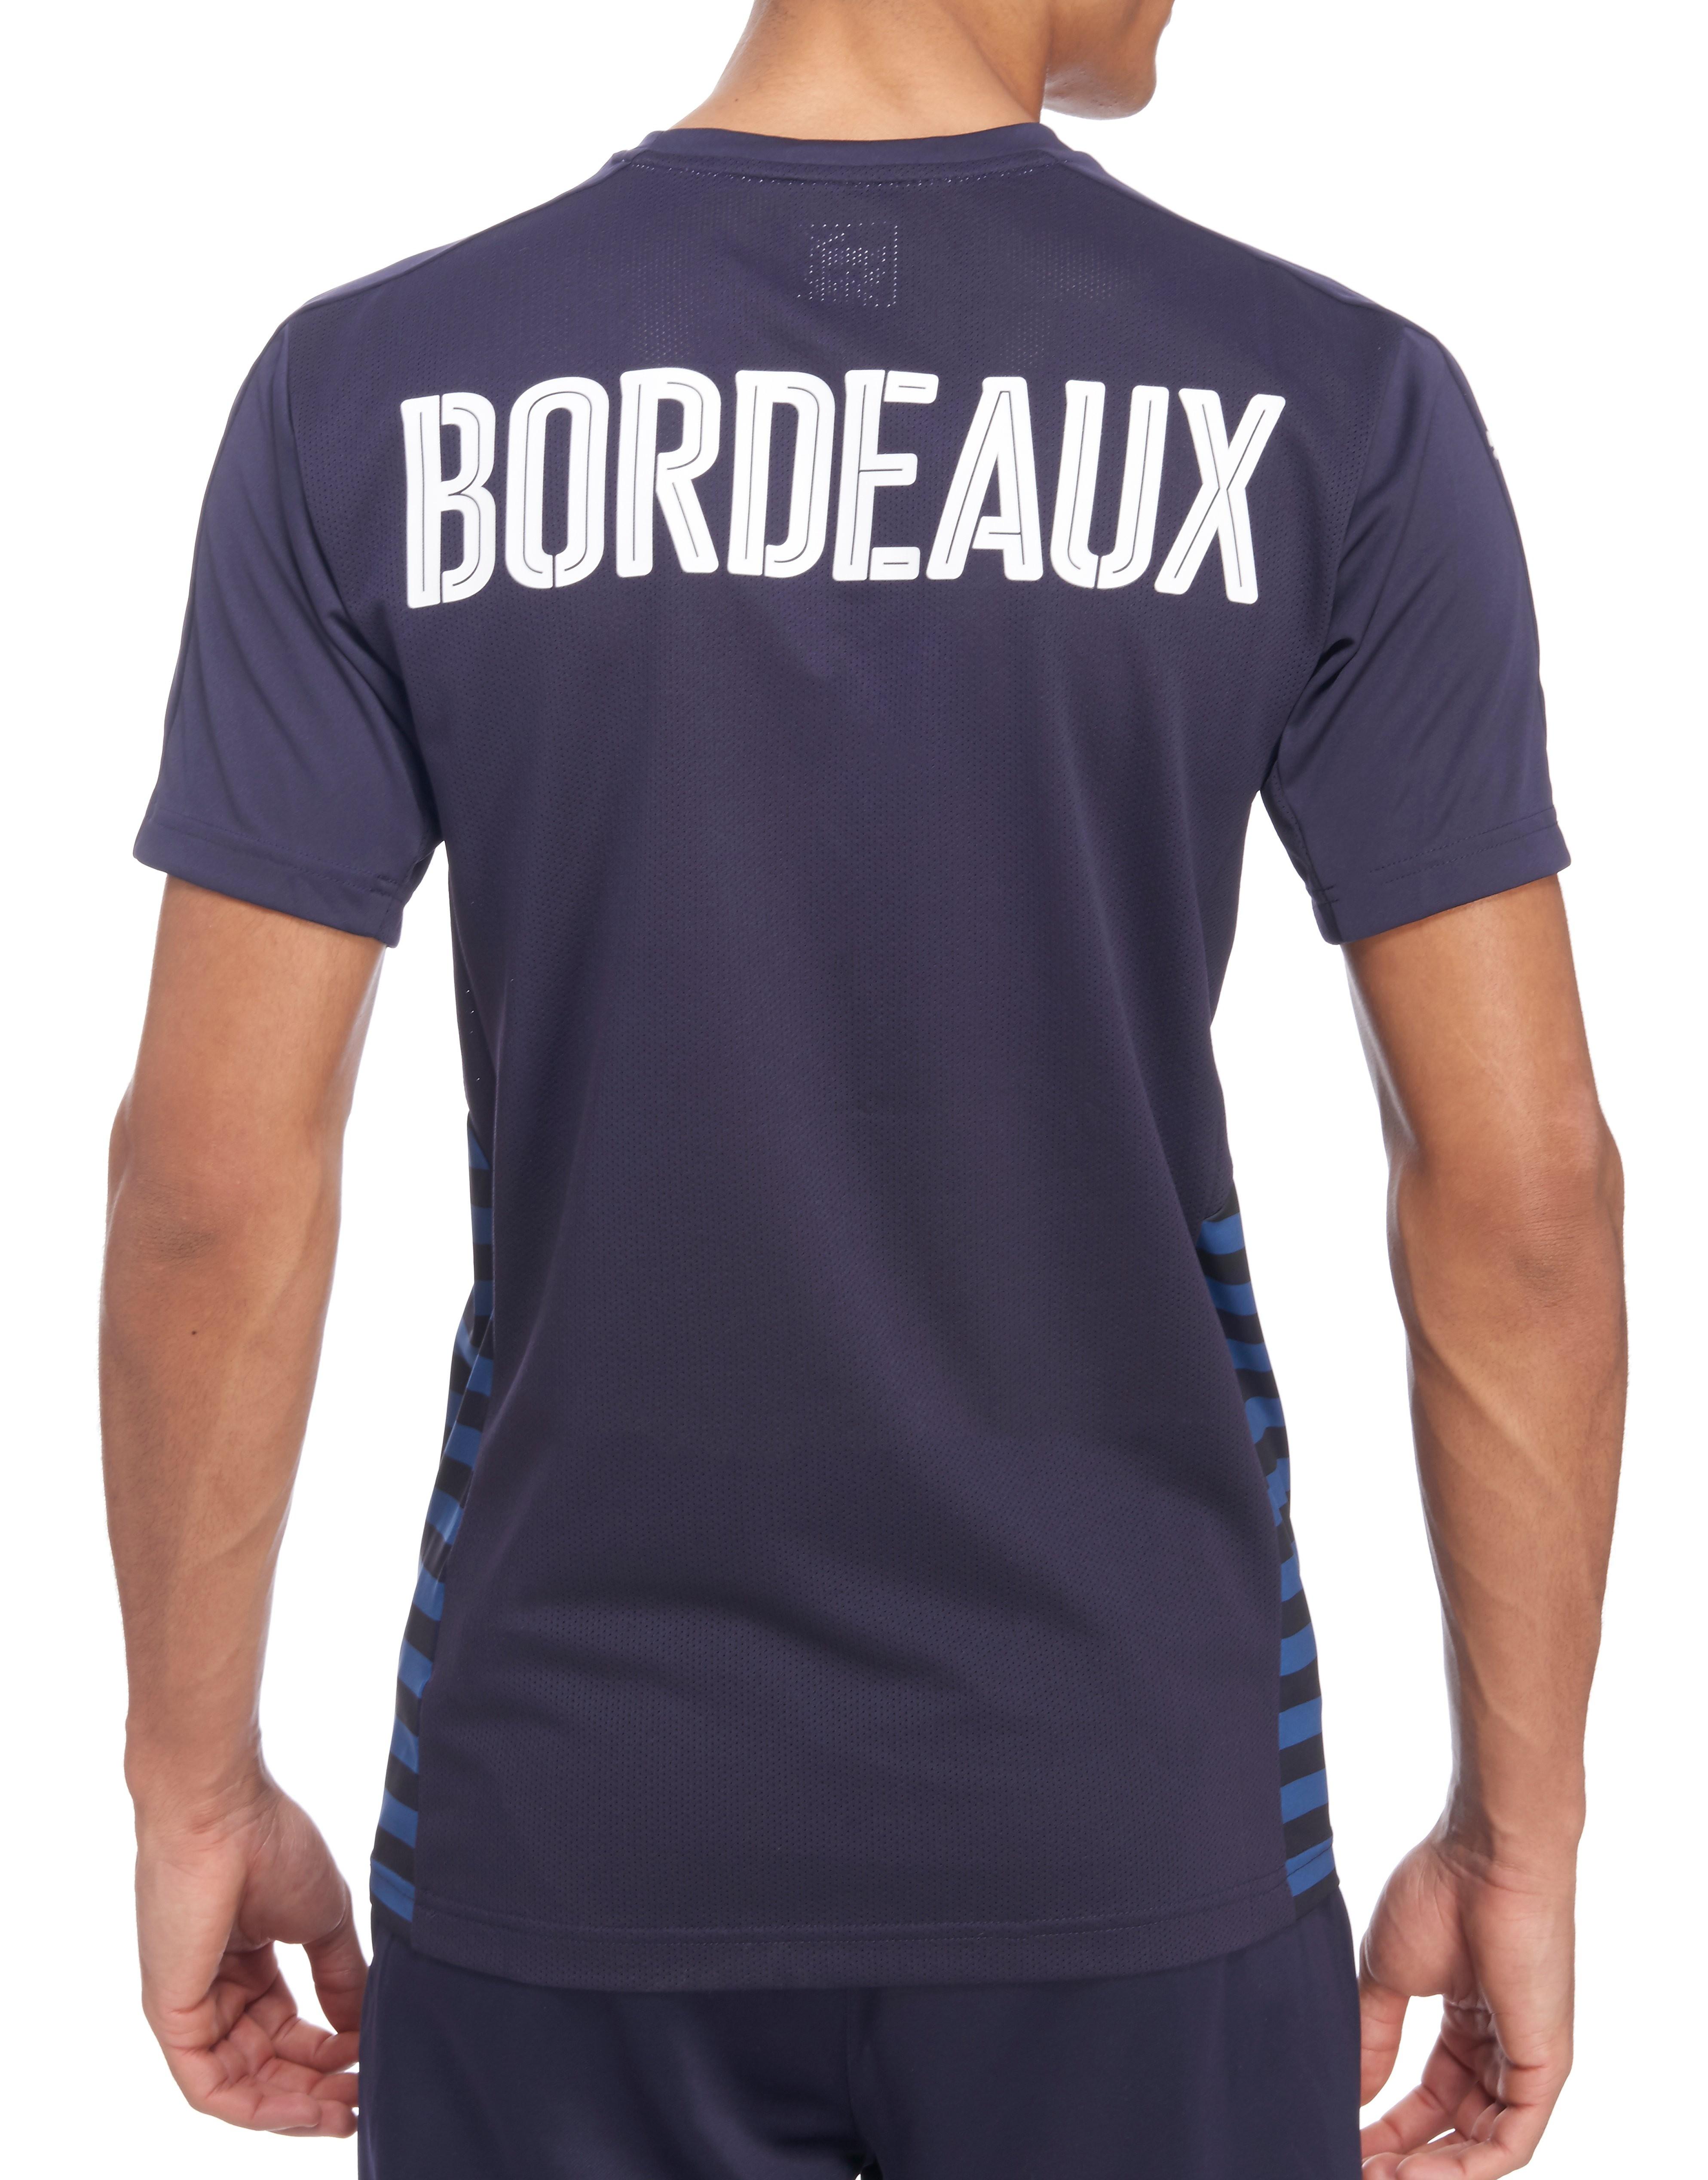 PUMA Bordeaux 2016/17 Stadium Jersey